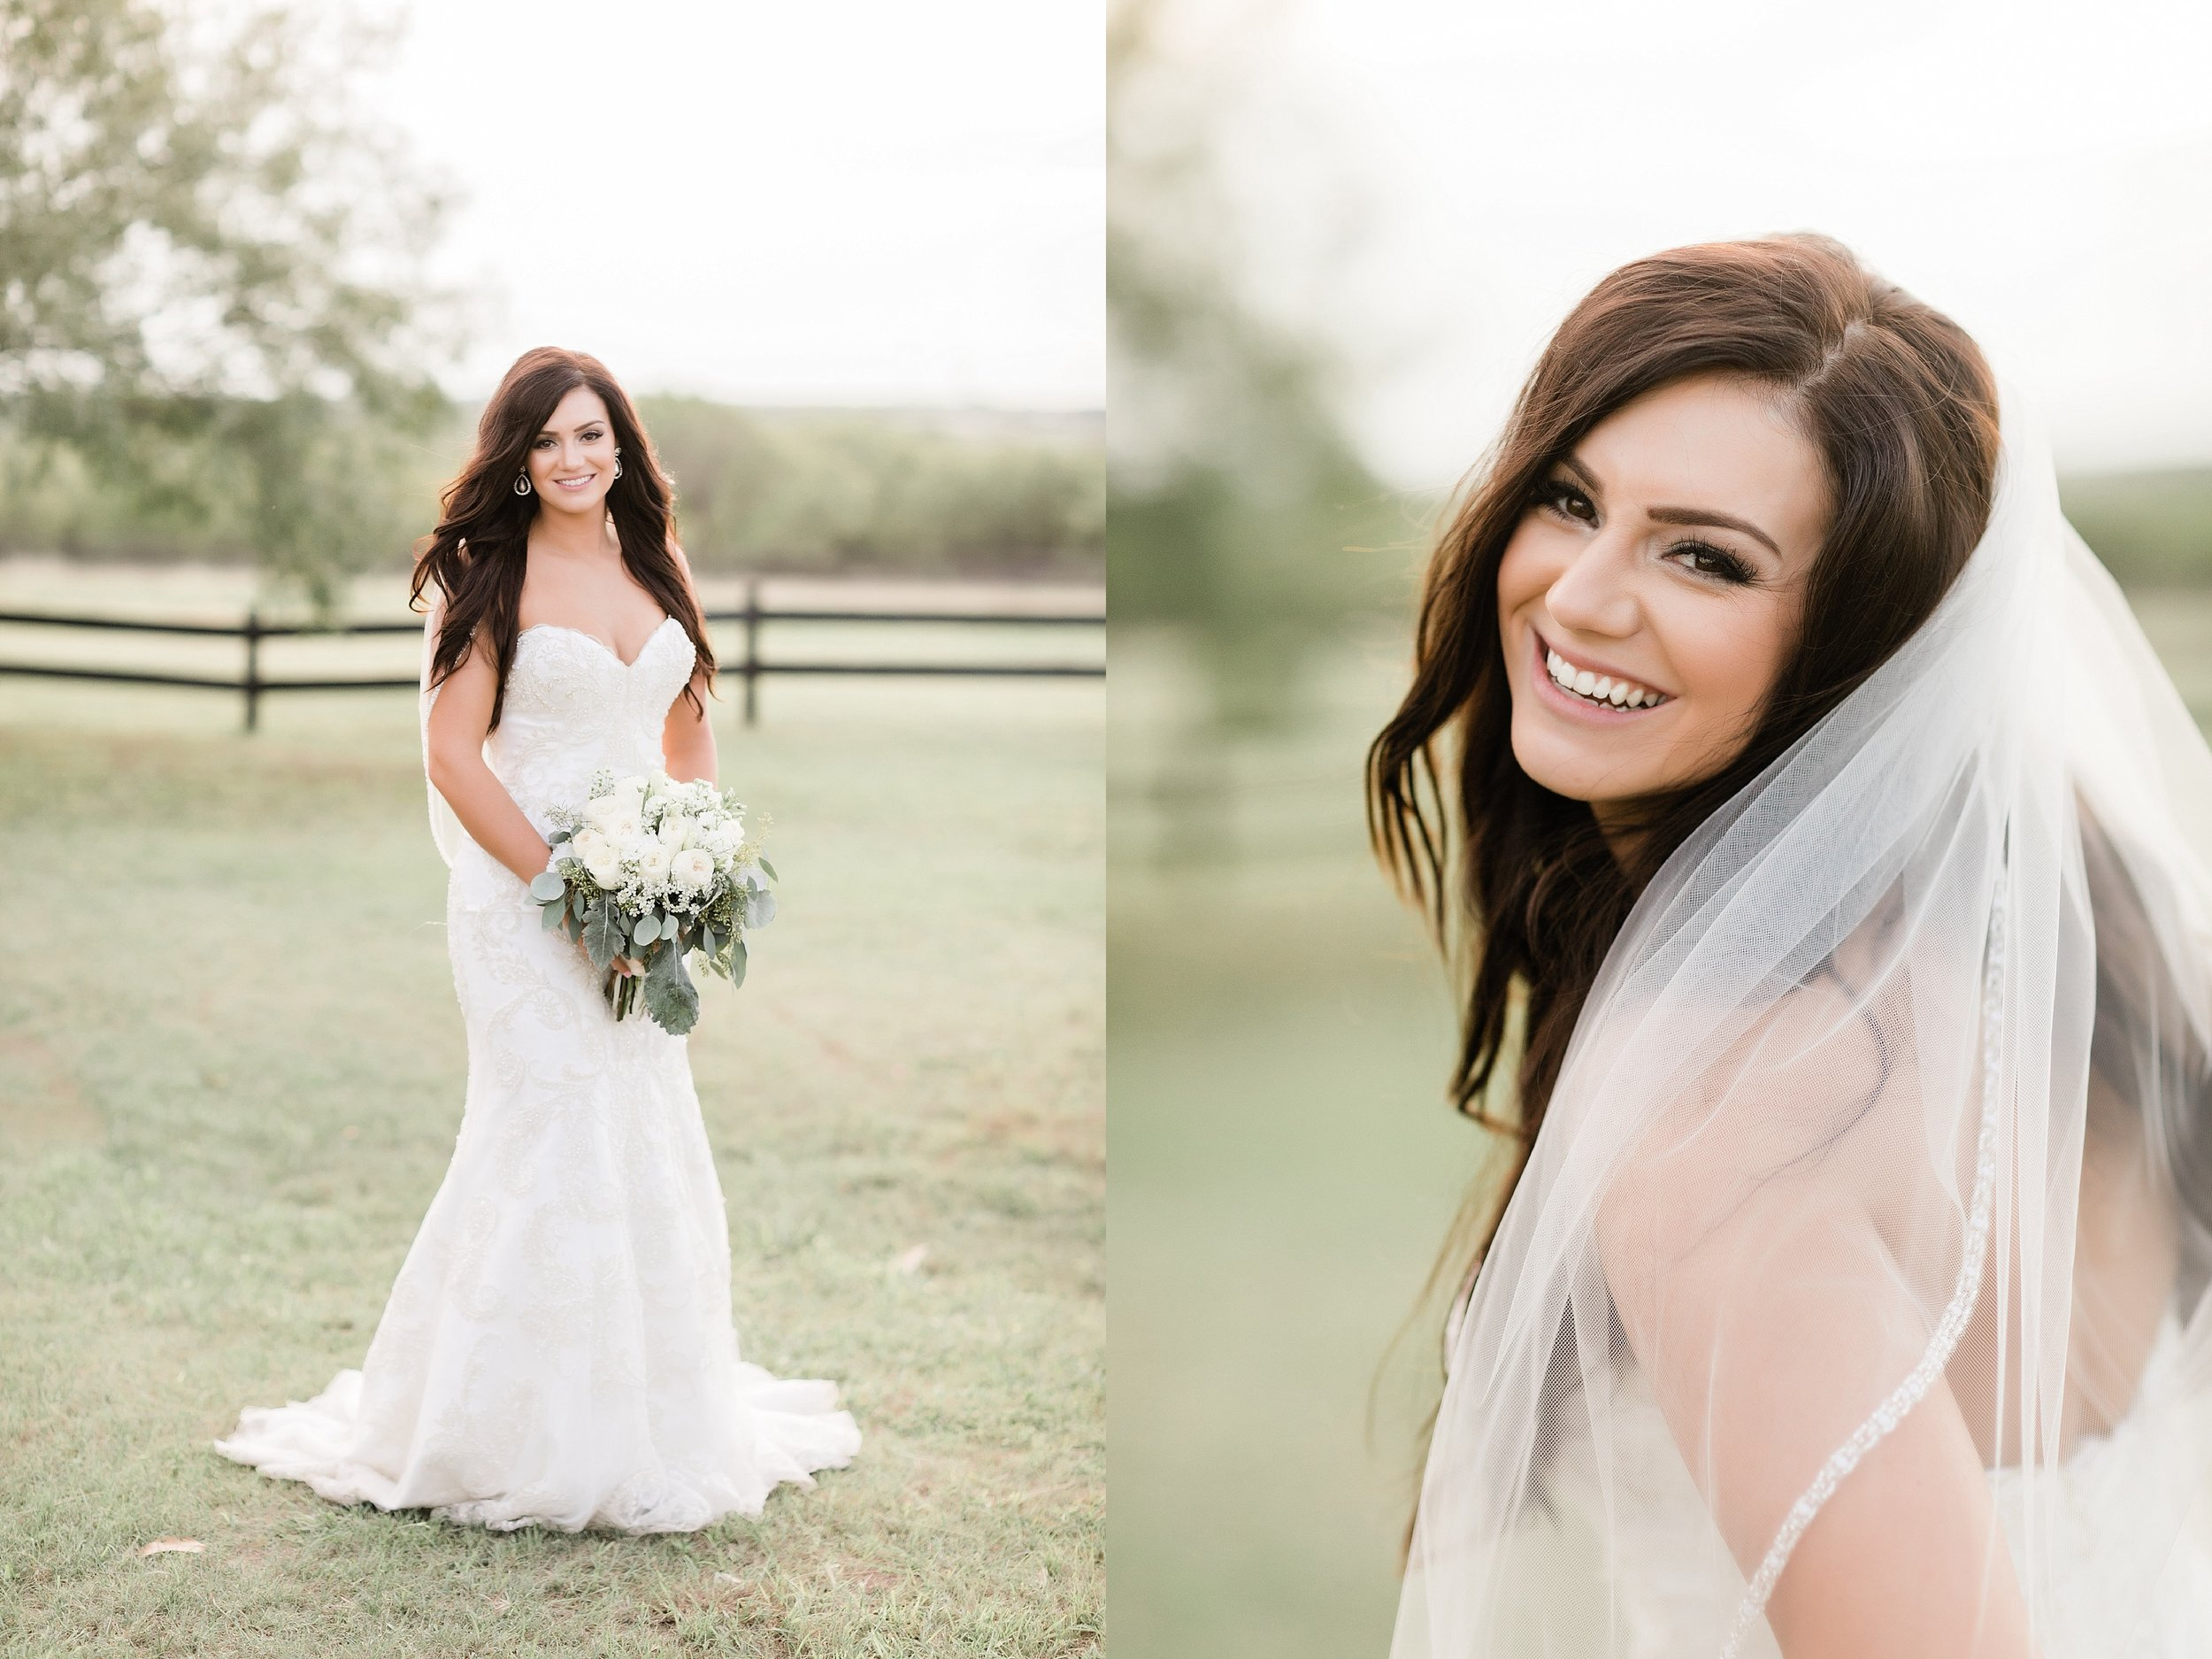 bailey-and-carl-coyote-ranch-resort-wedding-photographer-wichita-falls-texas-destination-wedding-0050.jpg